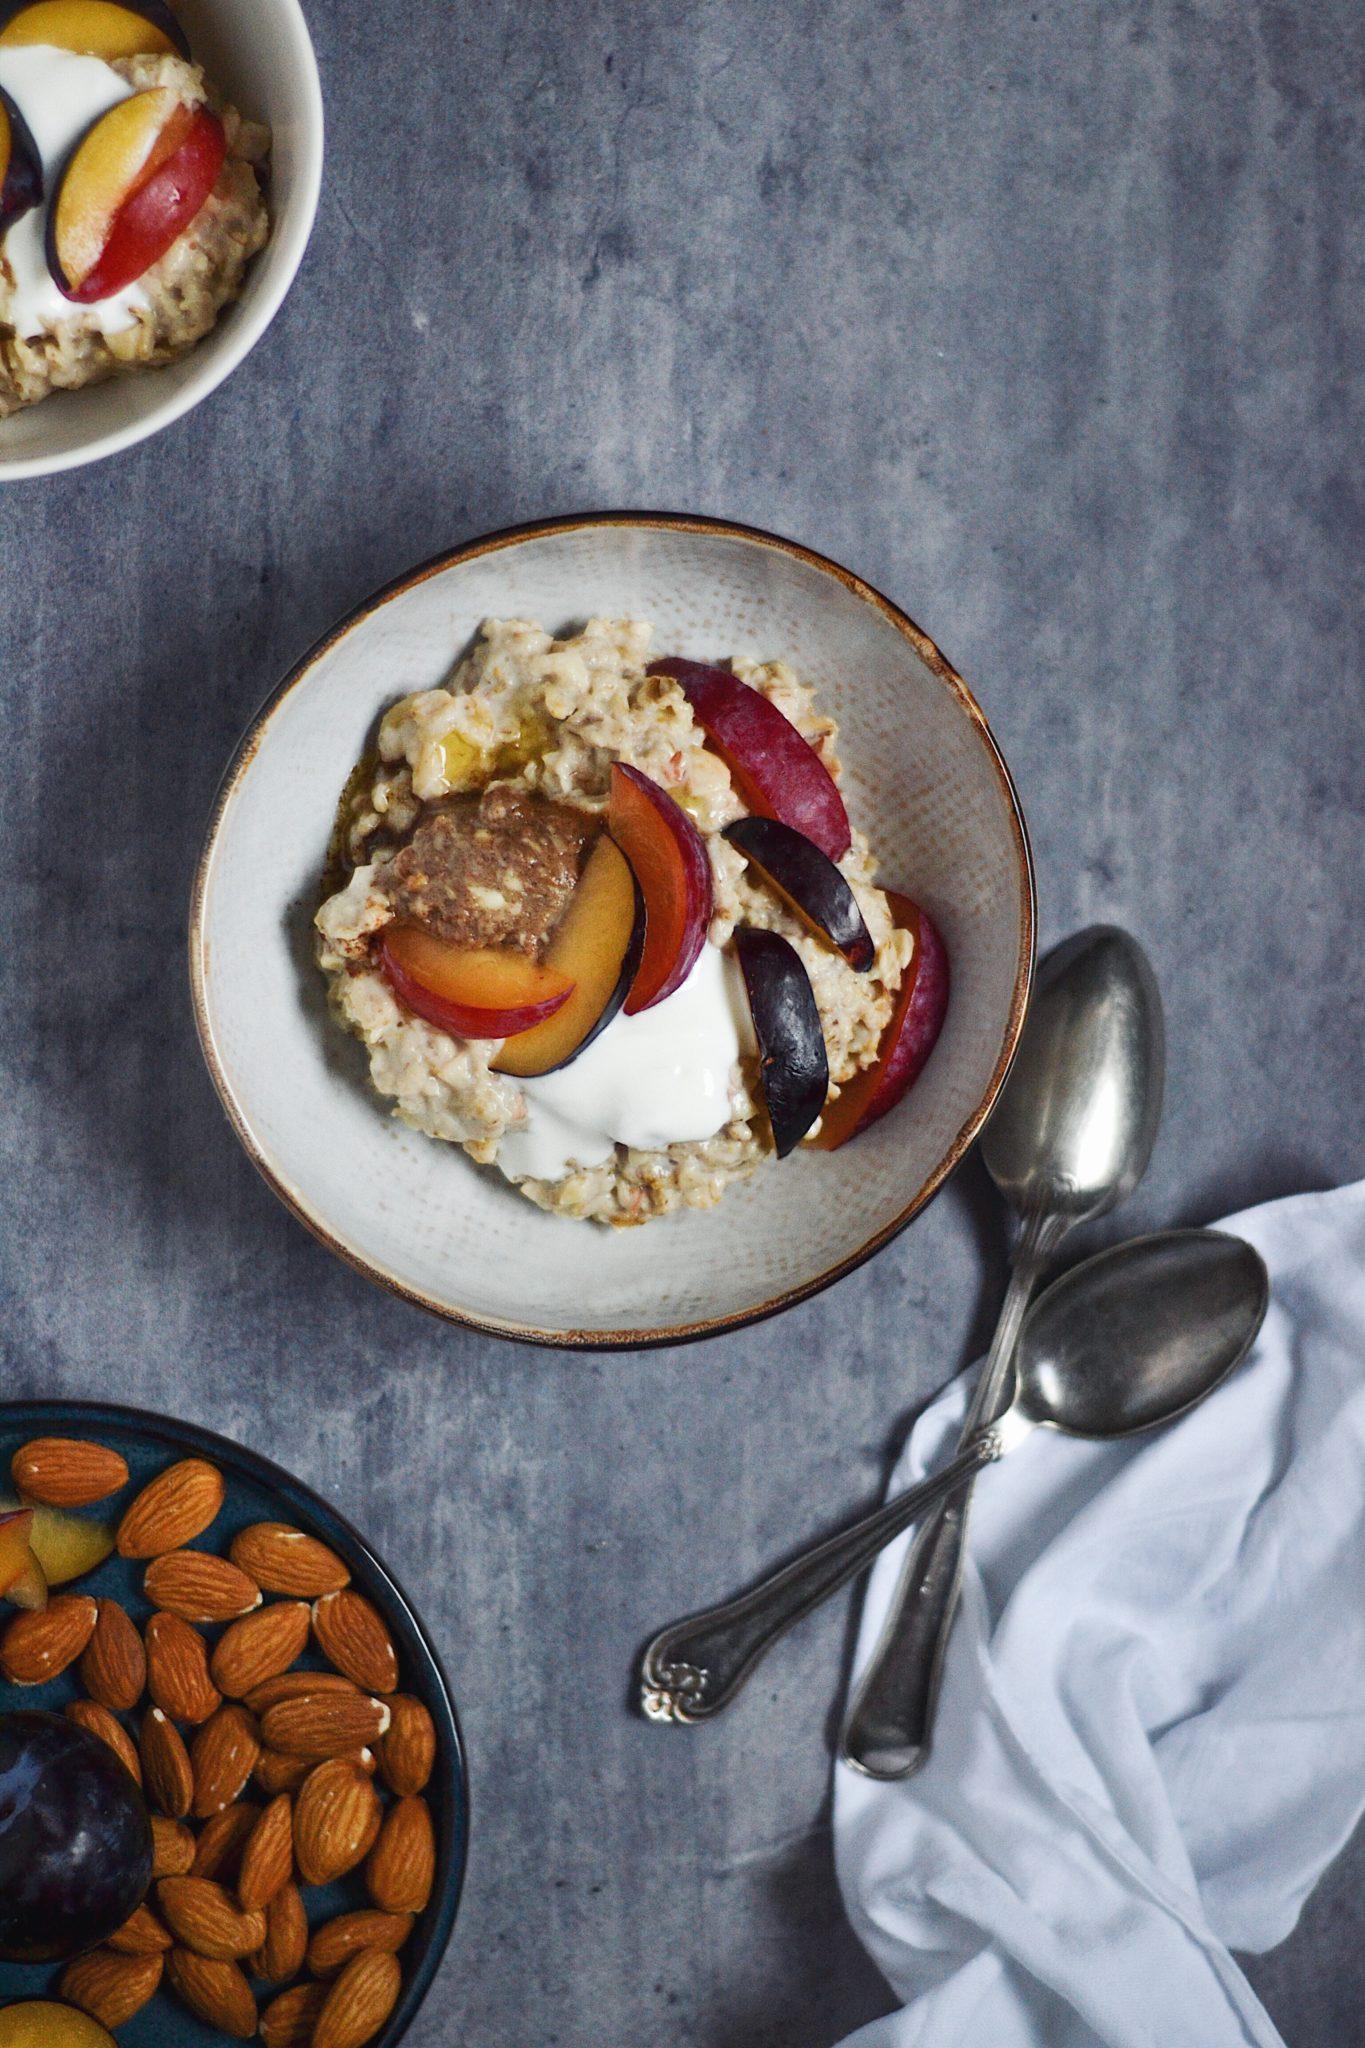 Mandelgrød med kanelsmør, blommer og skyr 10 favoritter // efterårsgrød